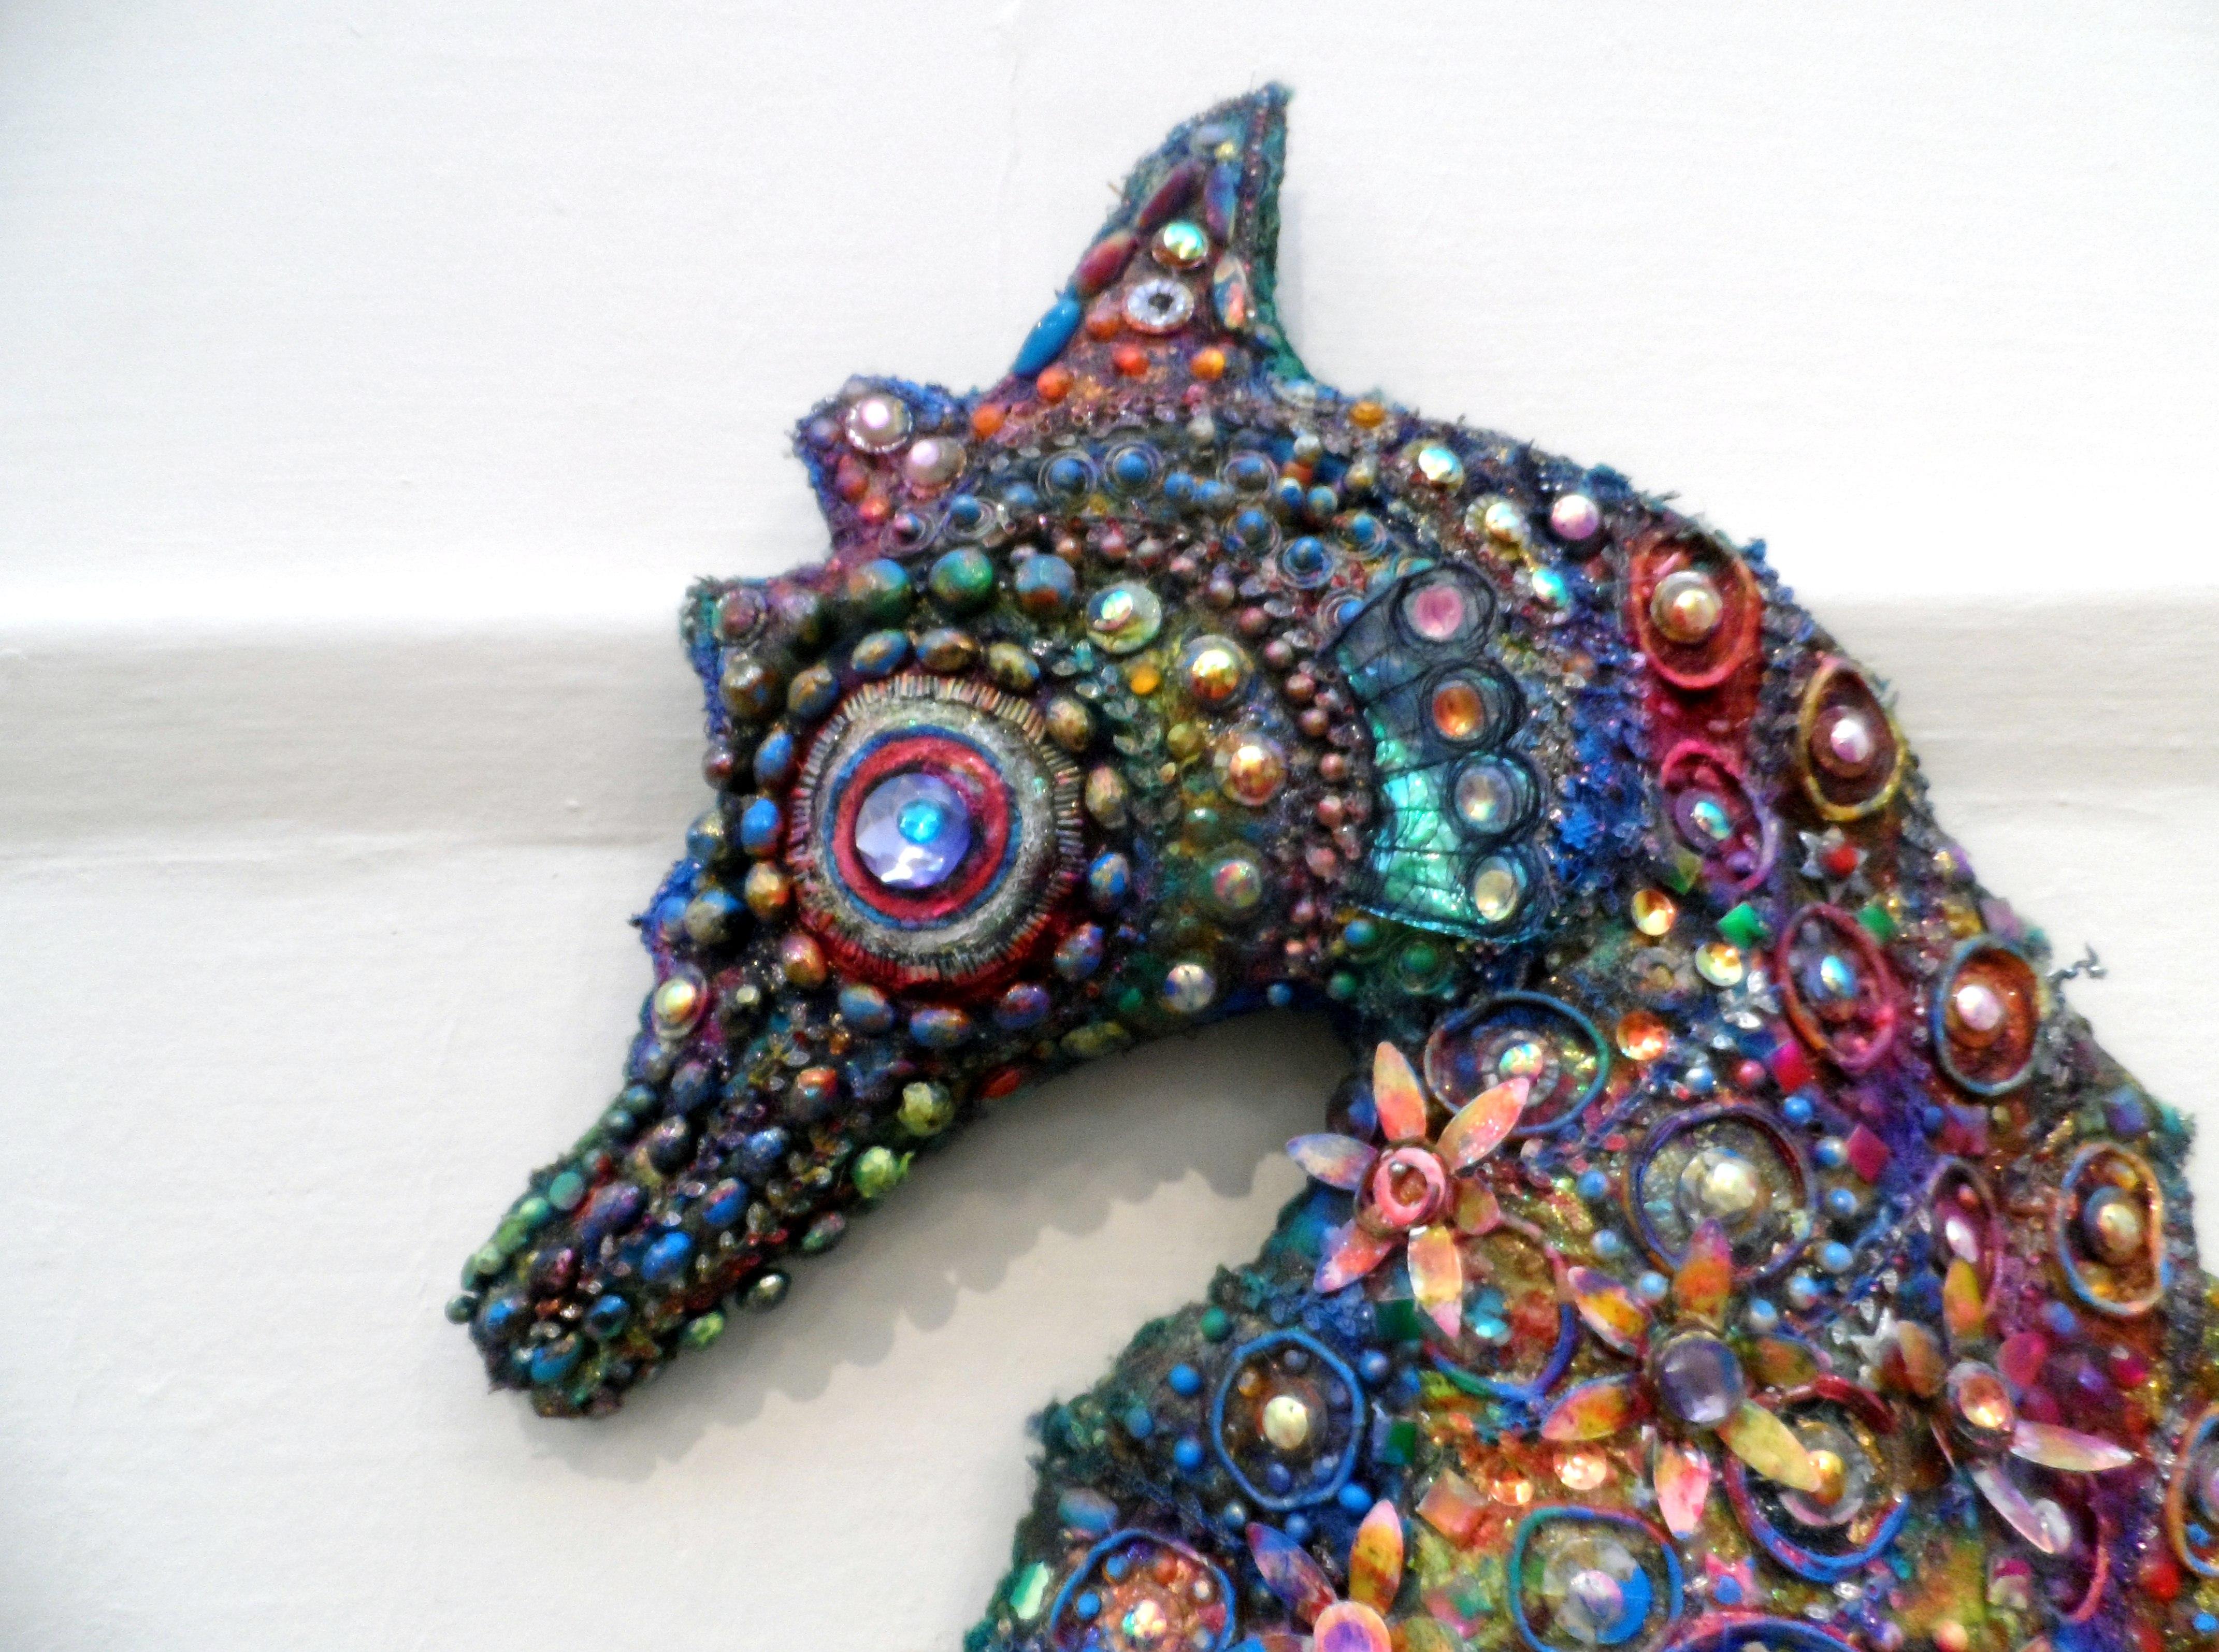 (detail) SEAHORSE by Nikki Parmenter, Williamson Gallery, 2019